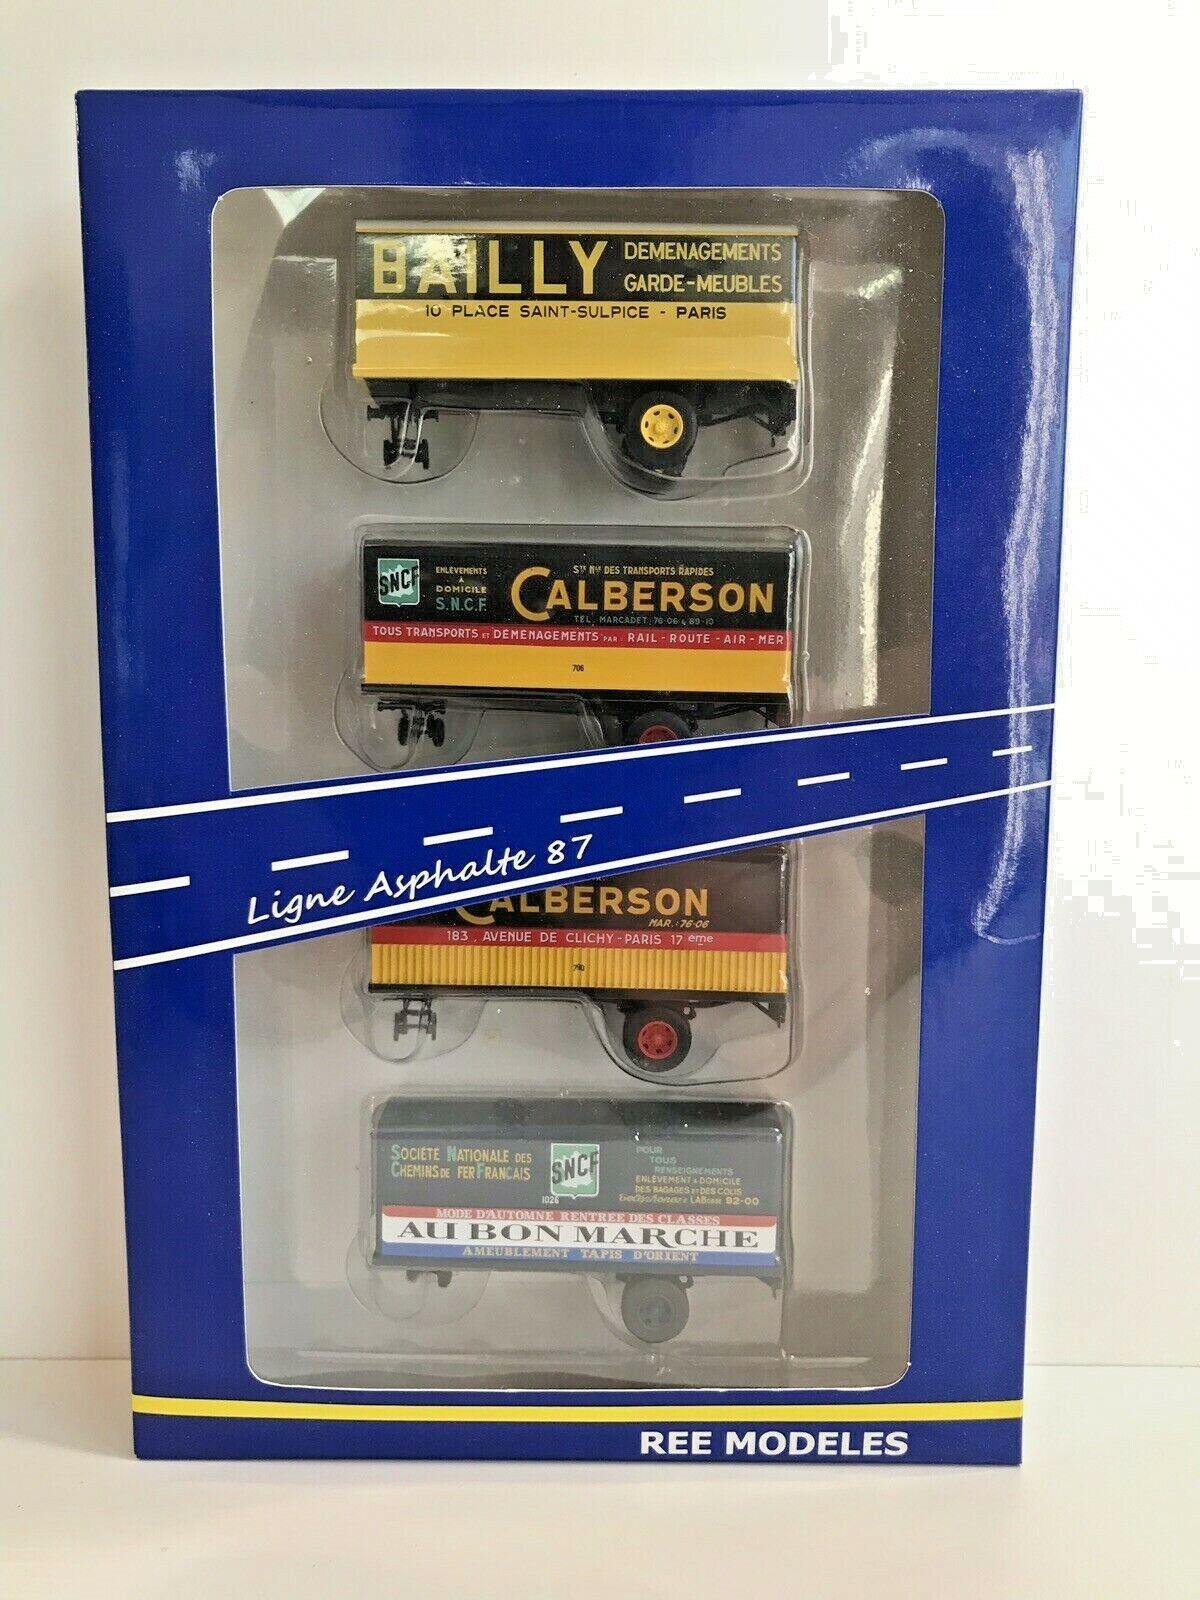 REE FB-006 - Asphalte 87 SET 4 remorques BAILLY CALBERSON AU BON MARCHÉ HO neuf